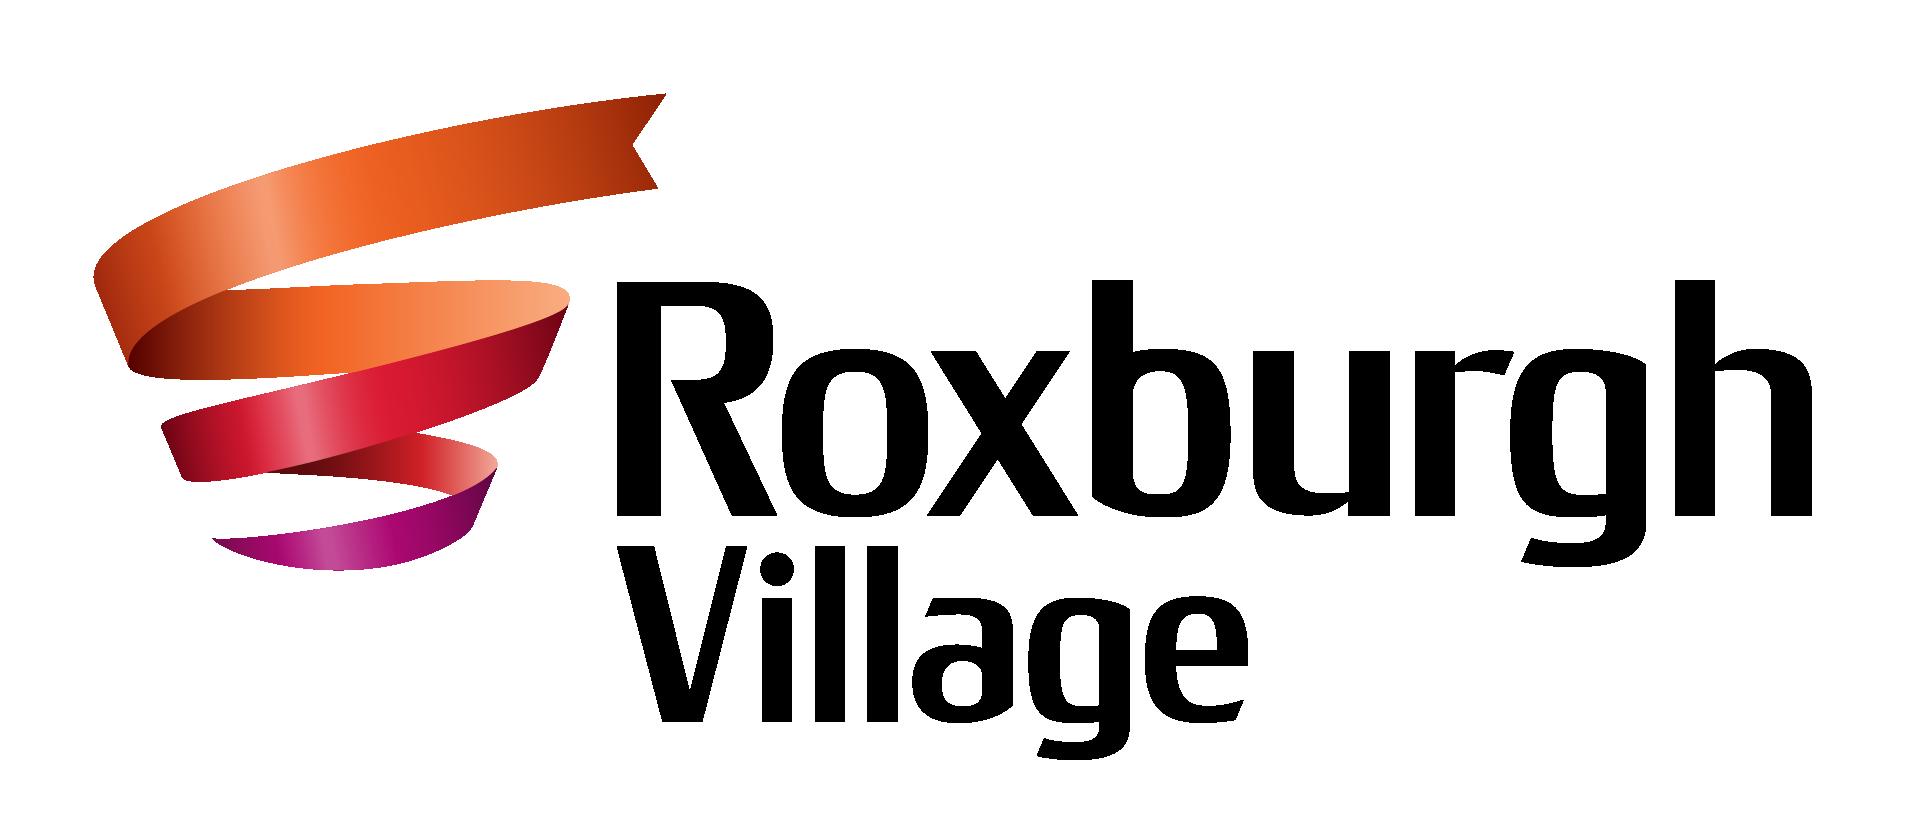 Roxburgh Village Logo